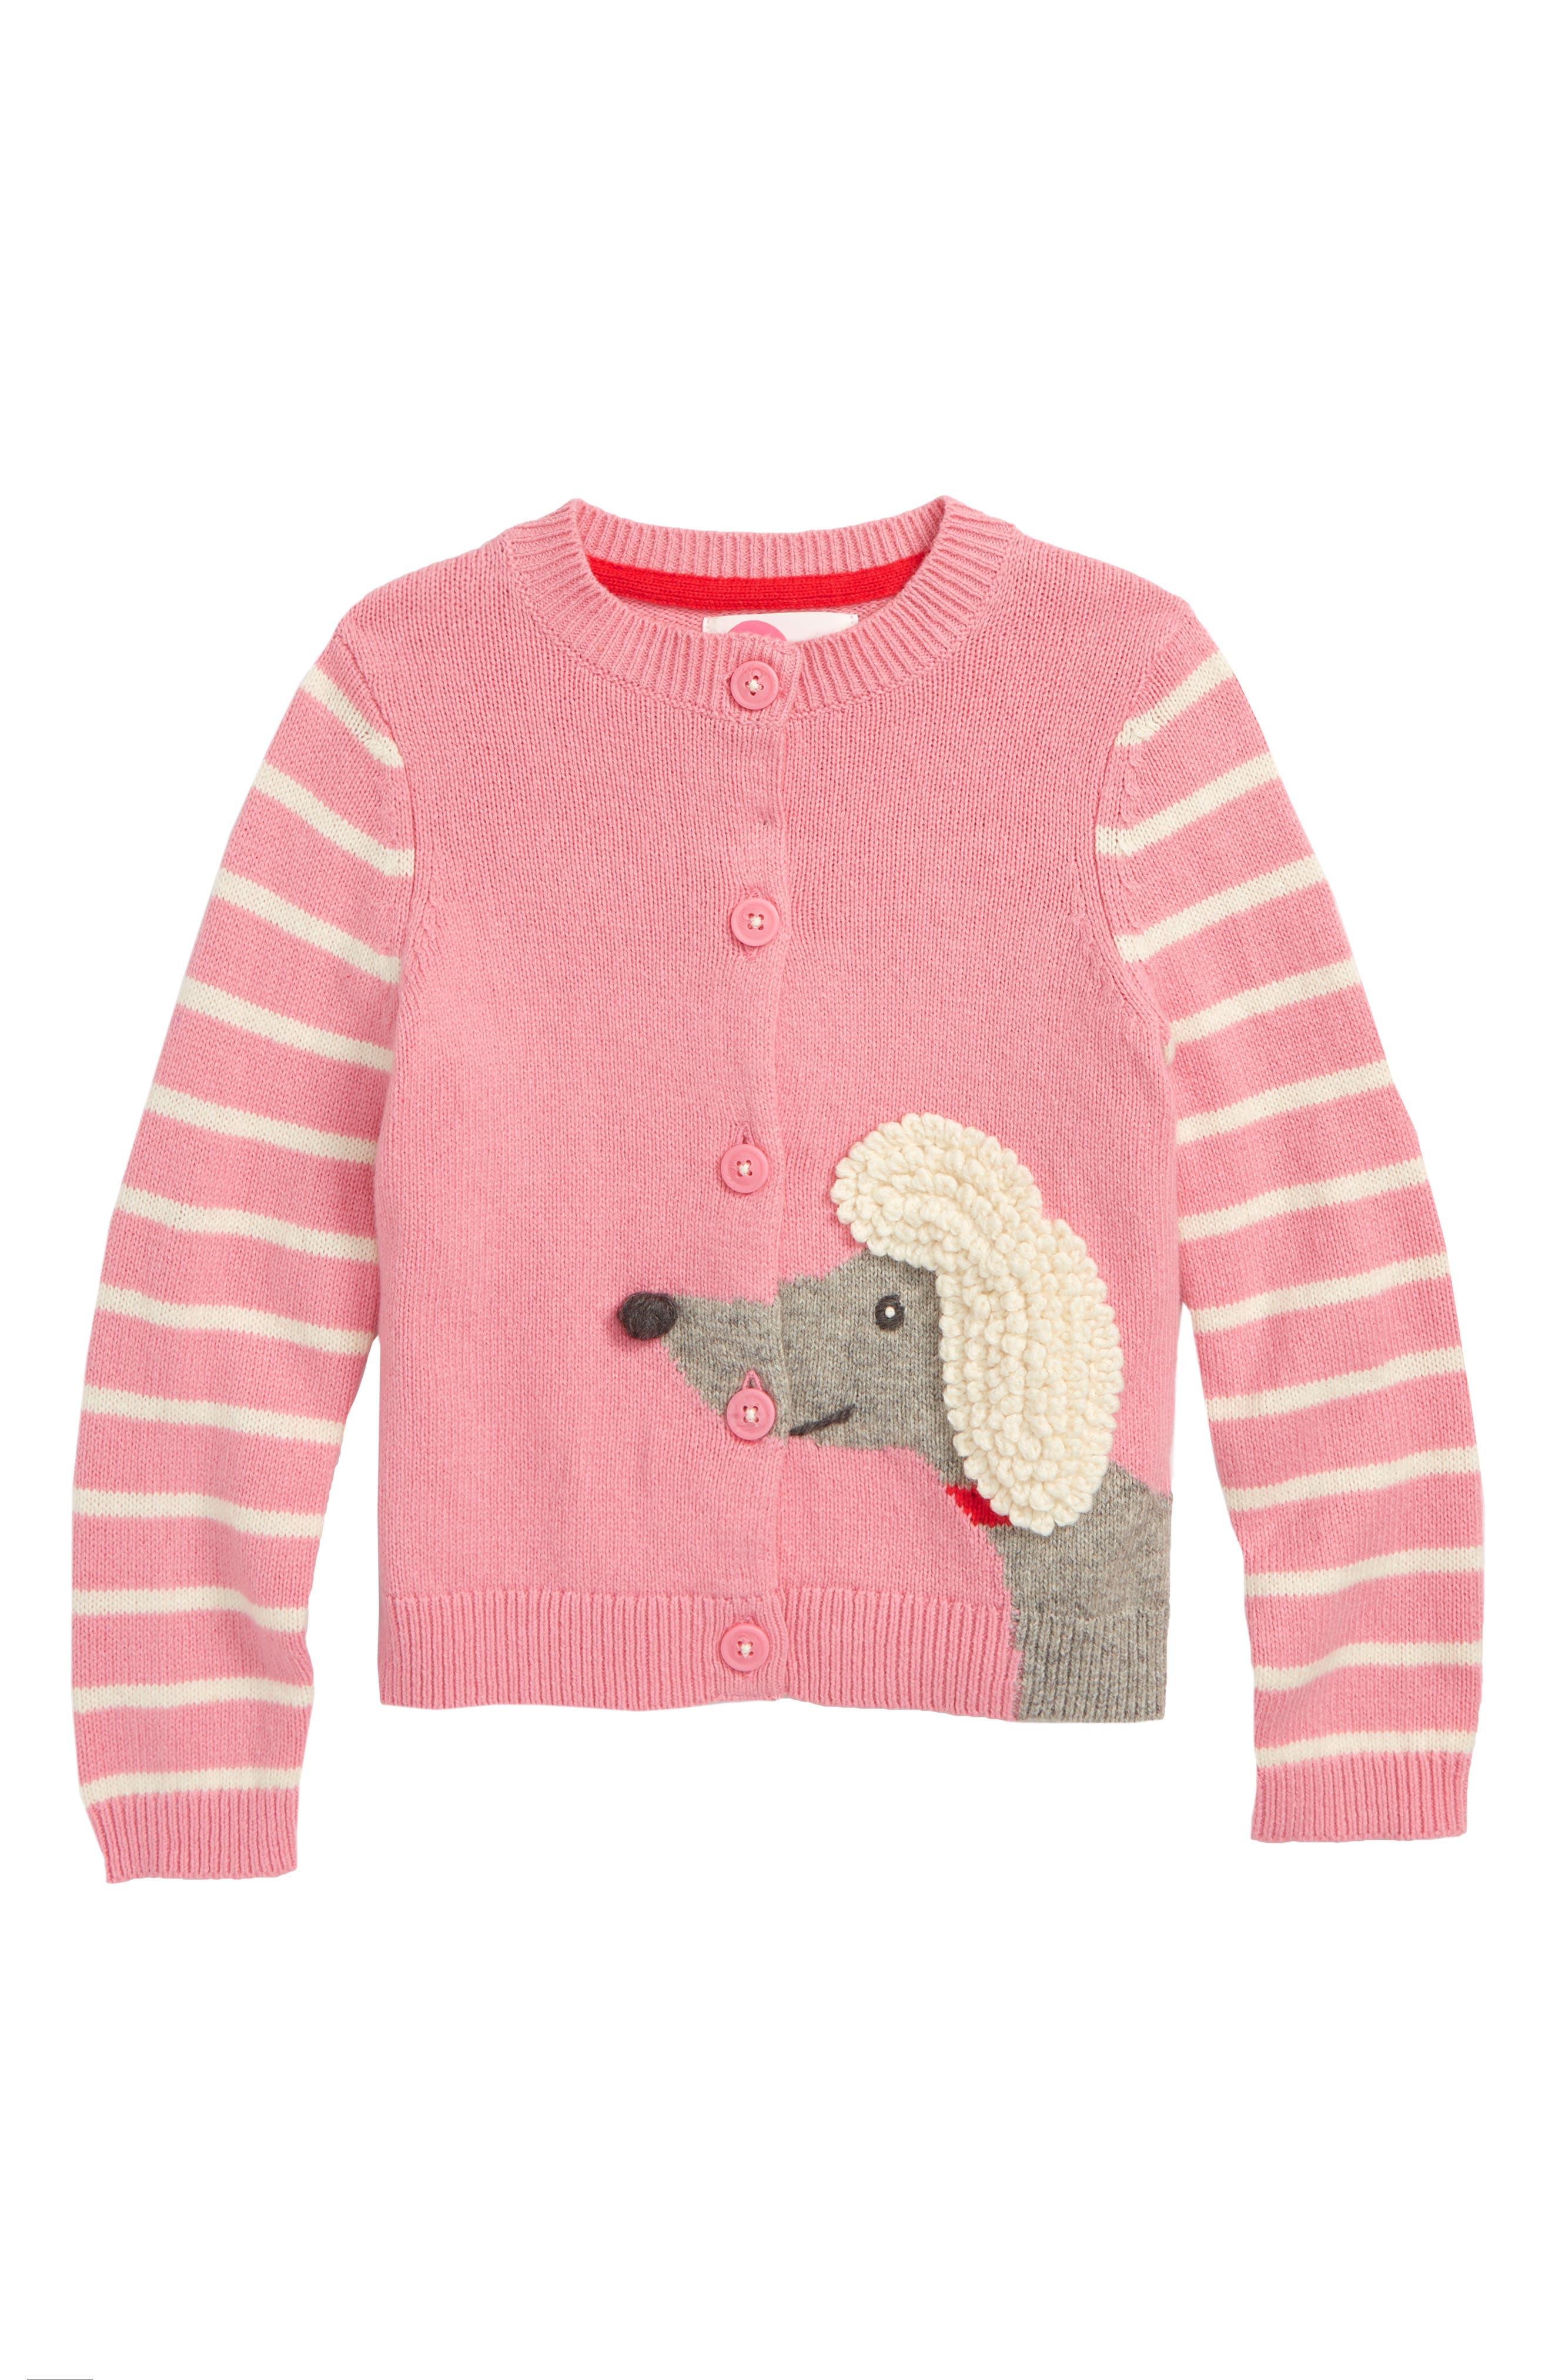 Pet Knit Cardigan,                             Main thumbnail 1, color,                             PNK FORMICA PINK POODLE